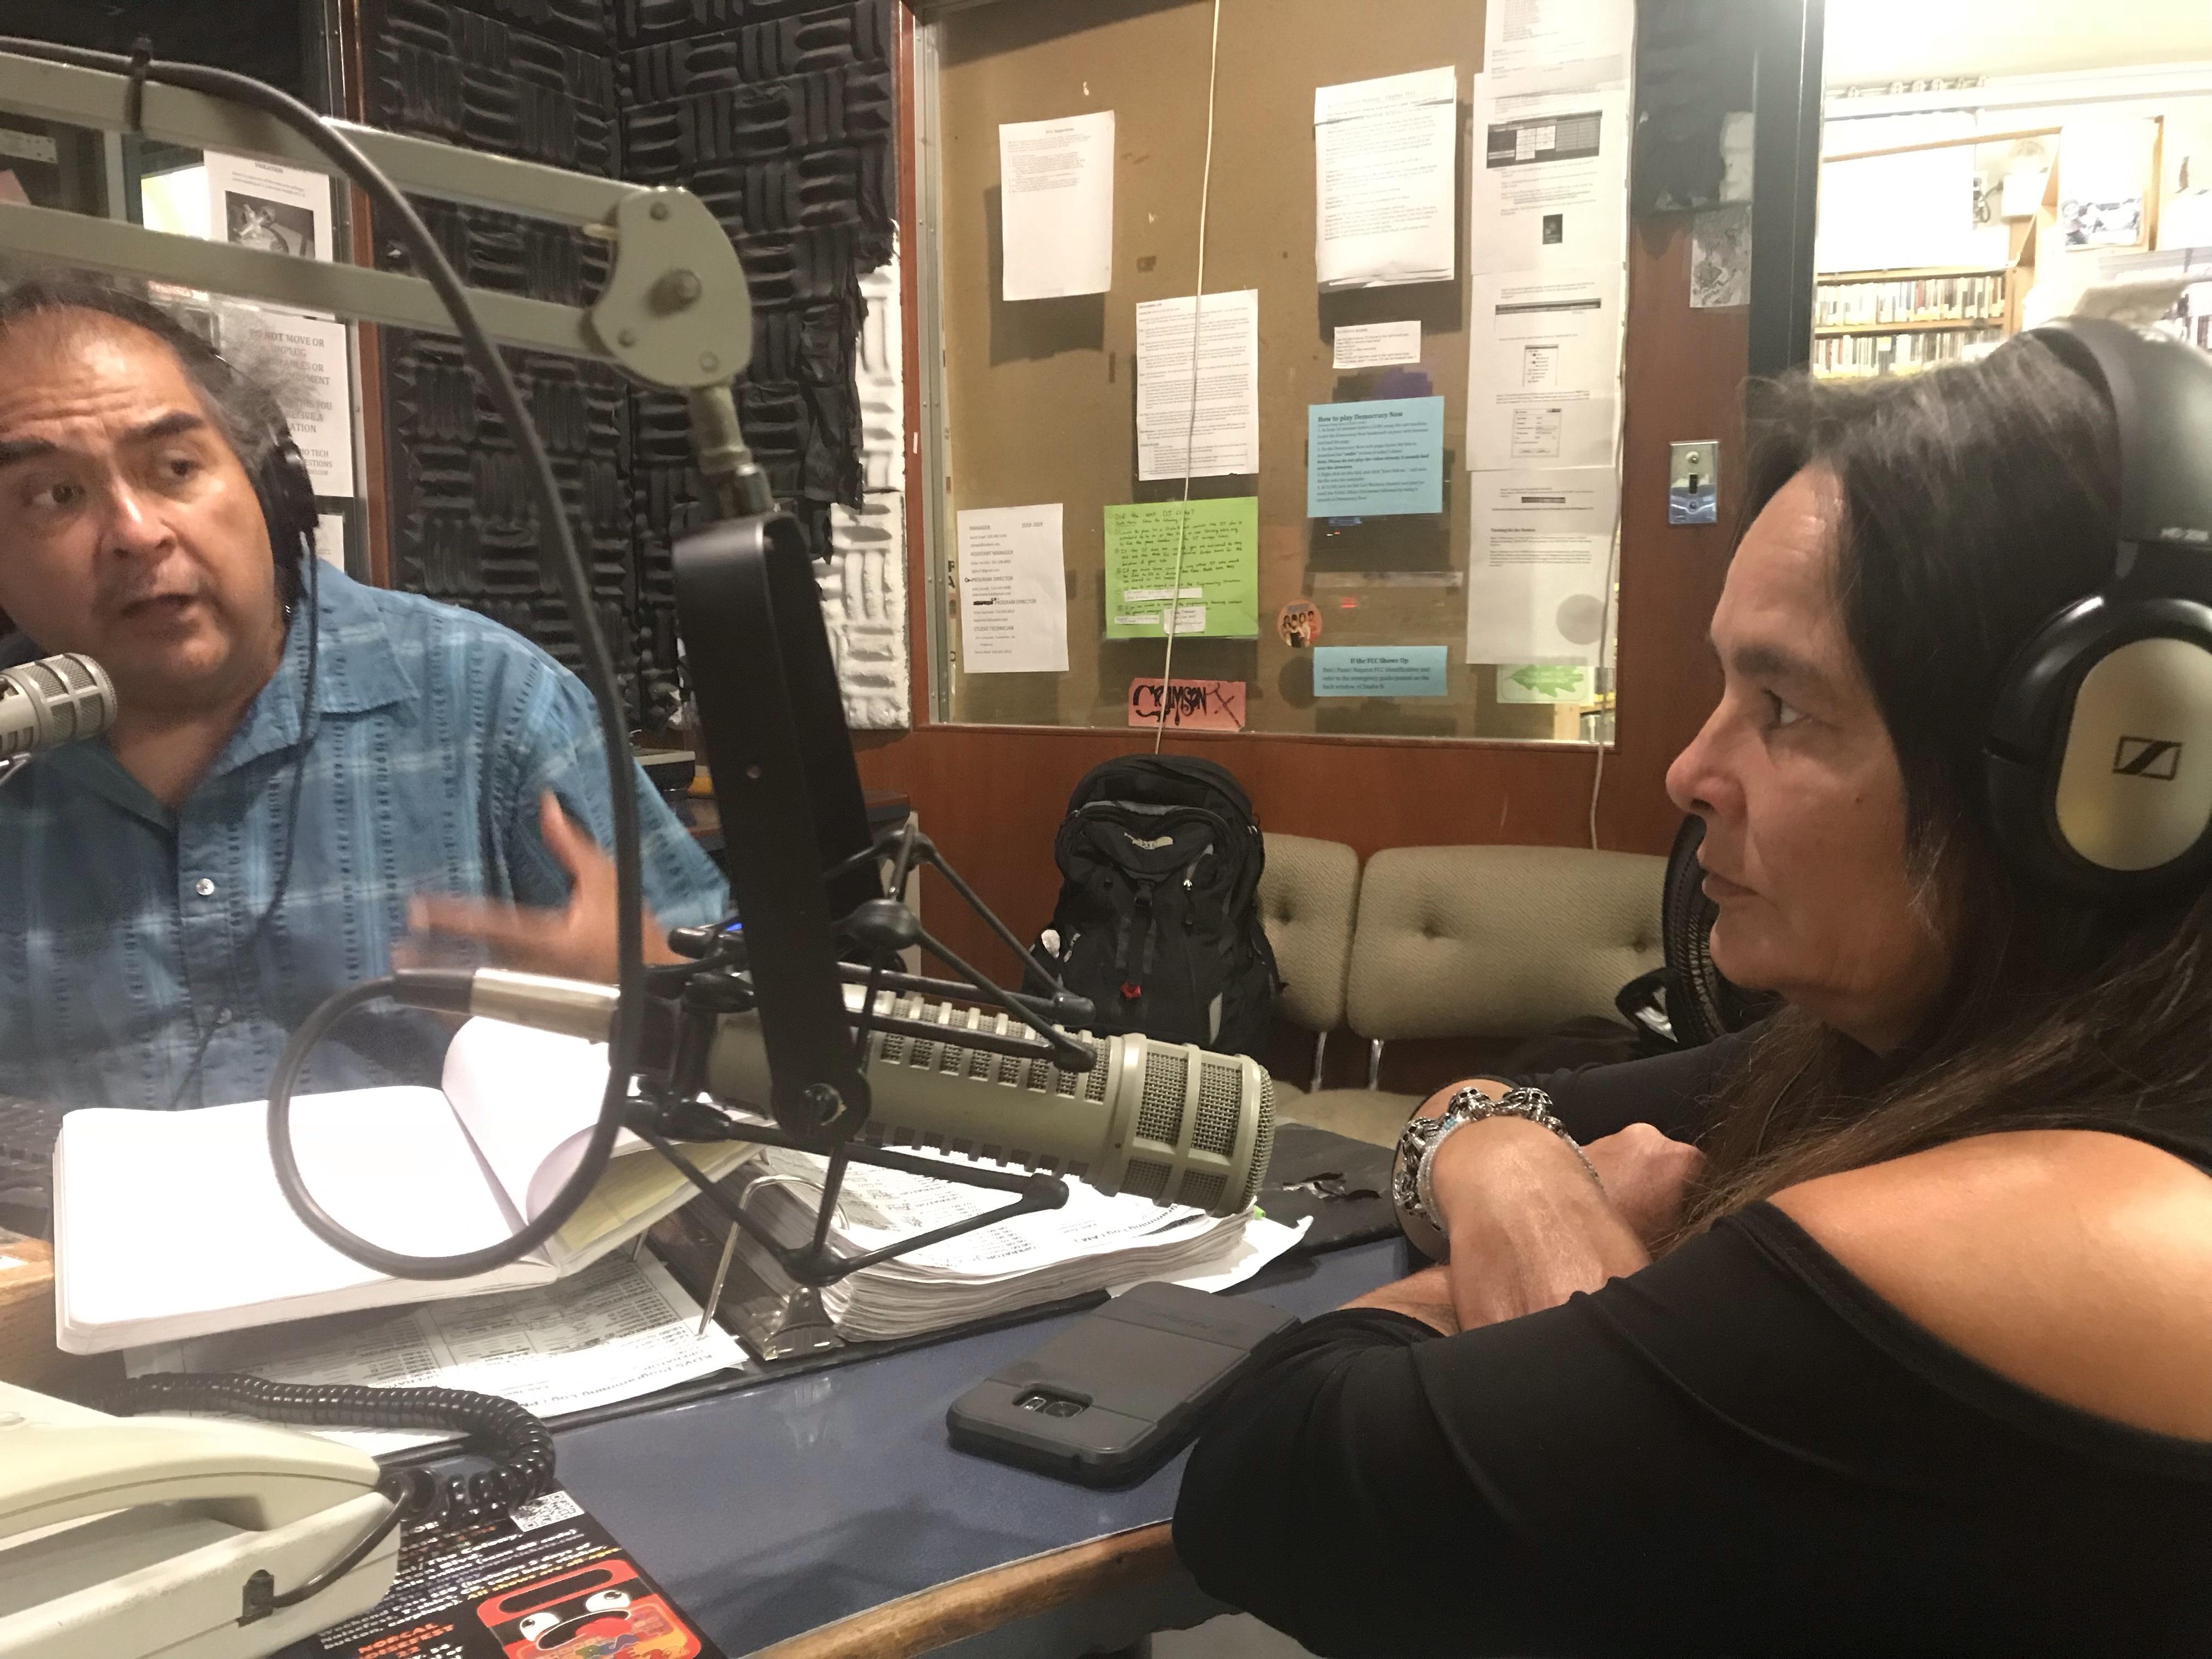 CA_Woodland_KDVS_Radio_interview_AdelitaSerena_MariaHunt_7834.jpg